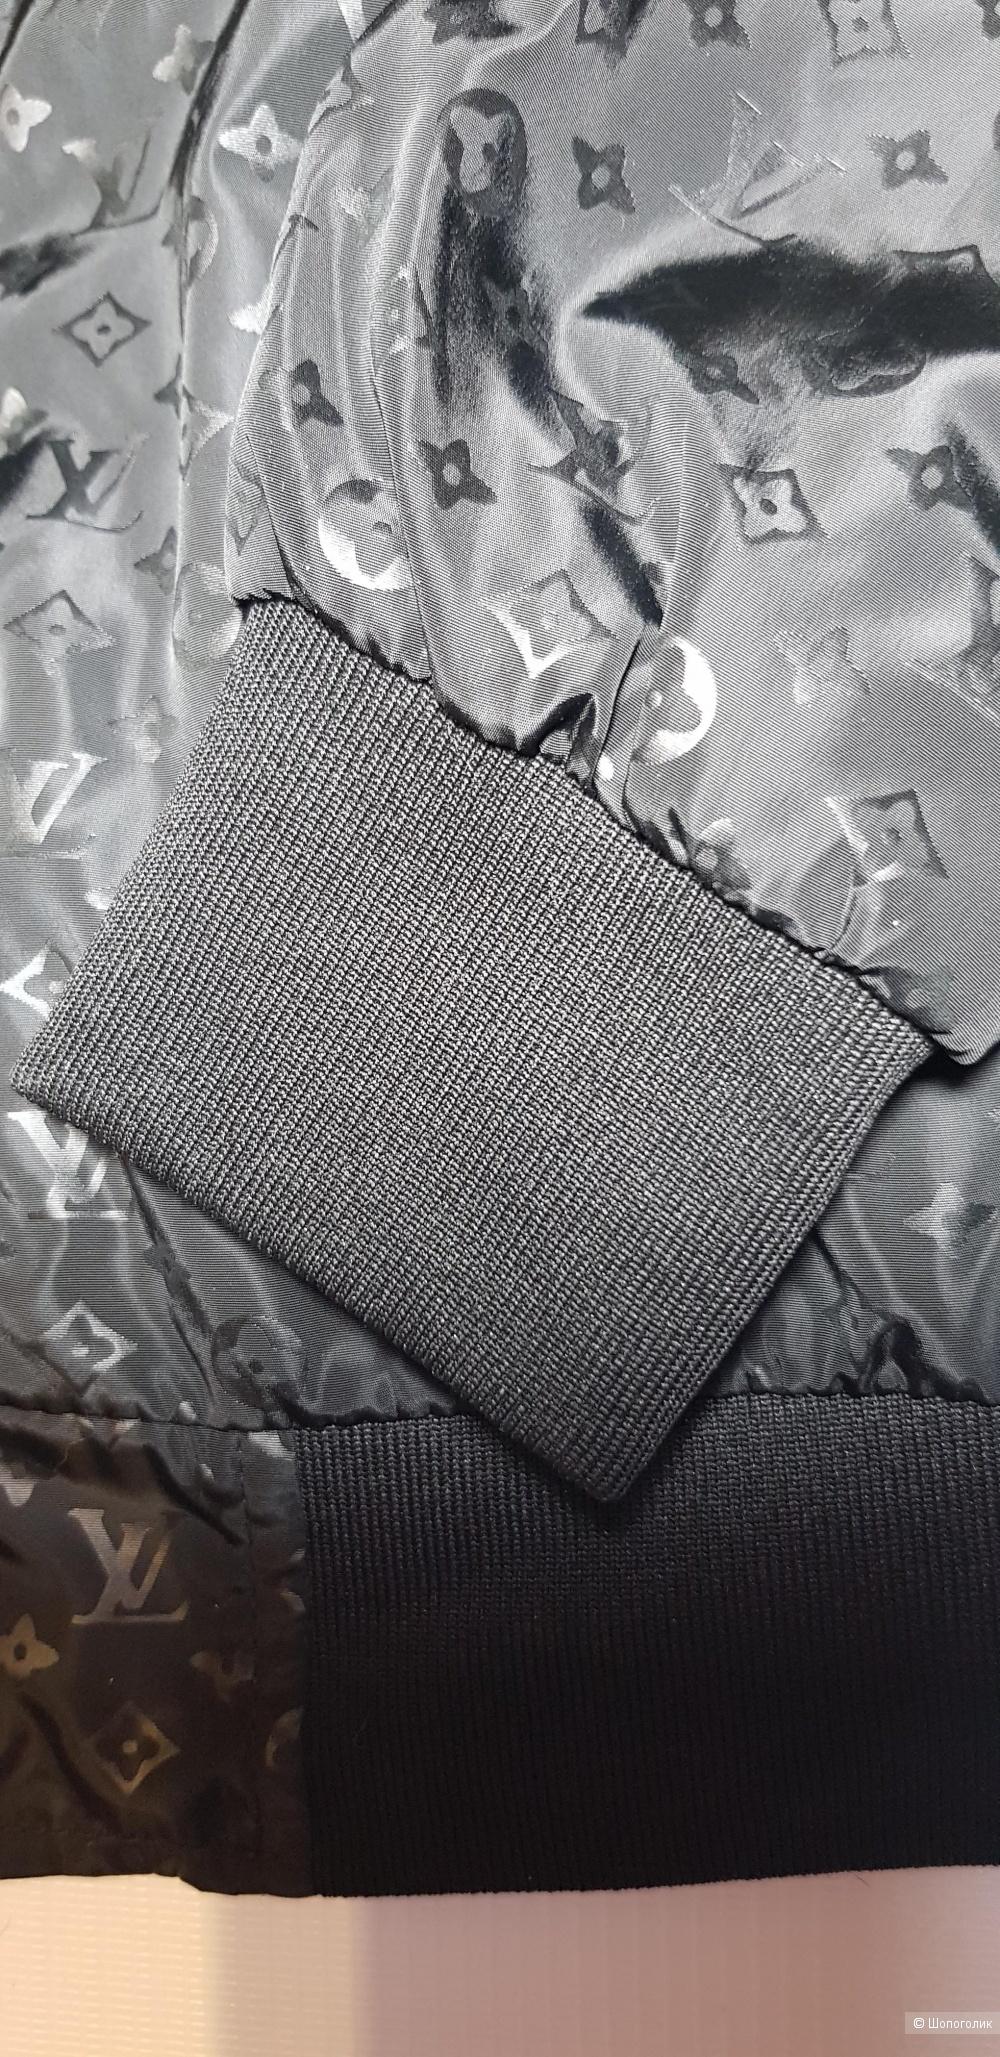 Ветровка Louis Vuitton  реплика , размер M и L